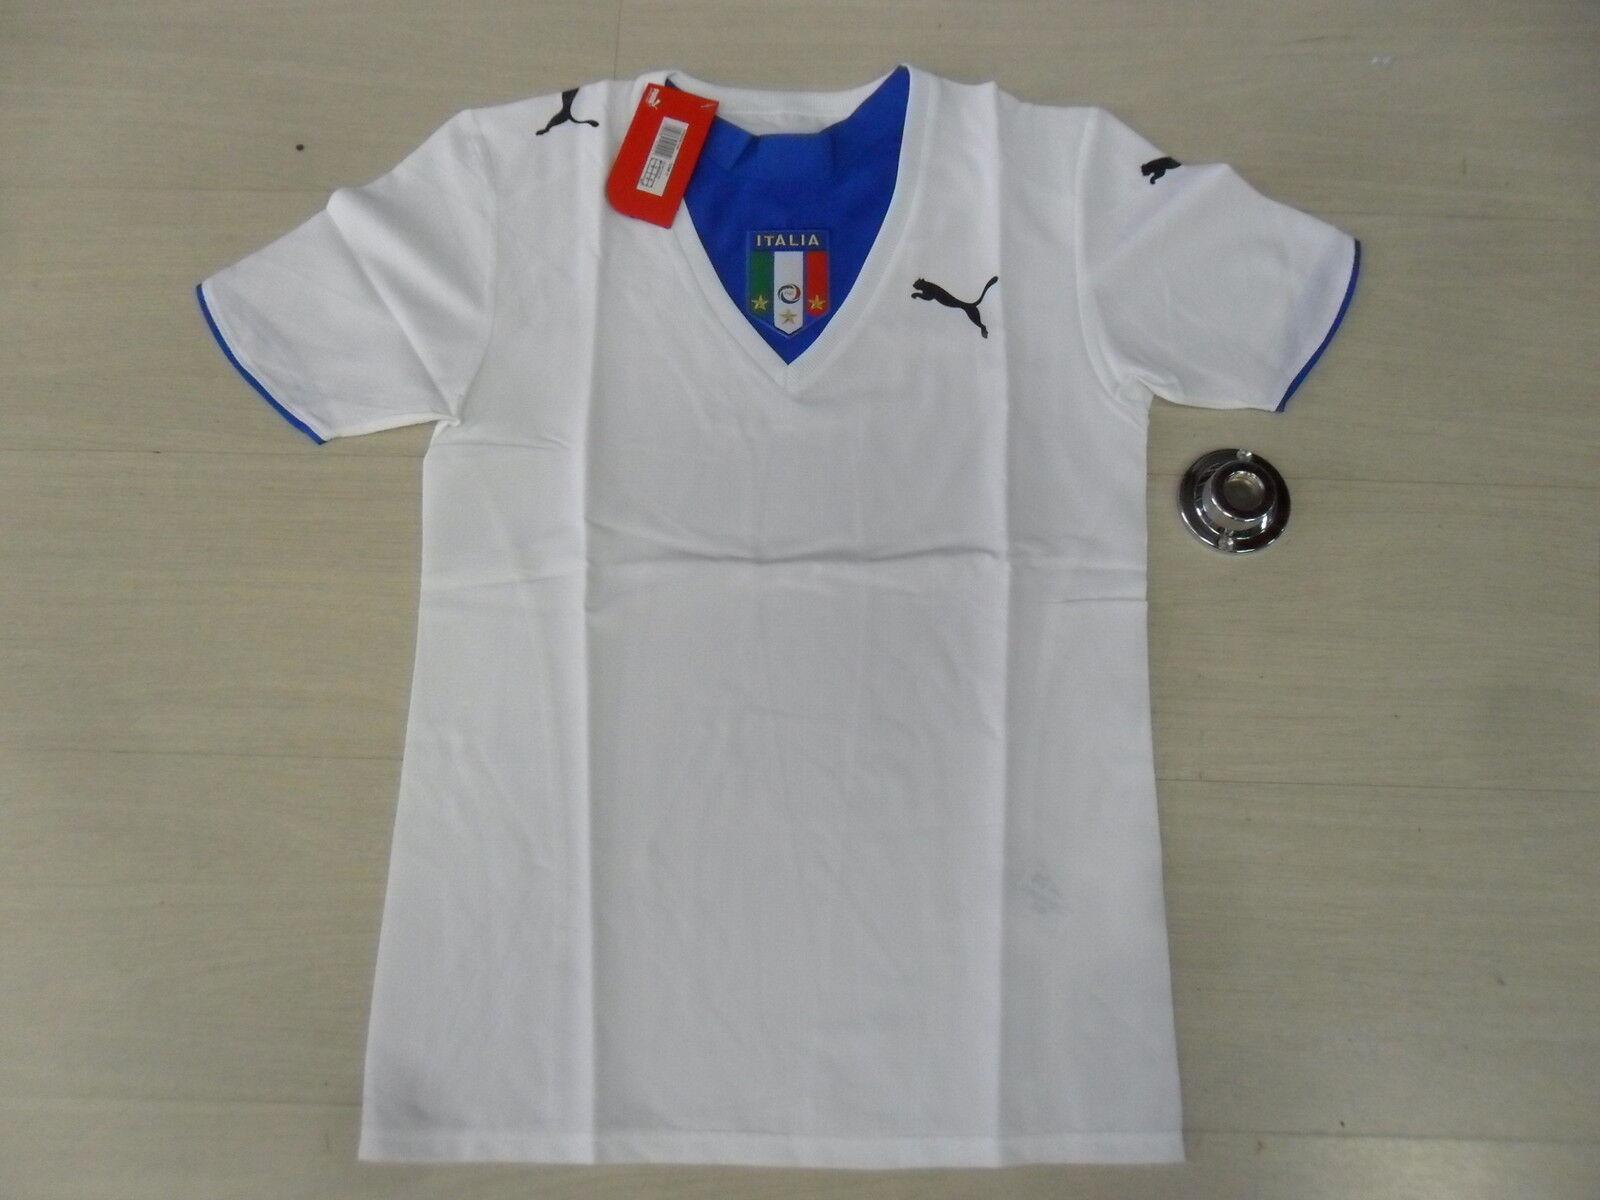 0950 TG XL ITALIA ITALY CAMISETA 3 STELLE UNA MANERA ALEMANIA 2006 SHIRT